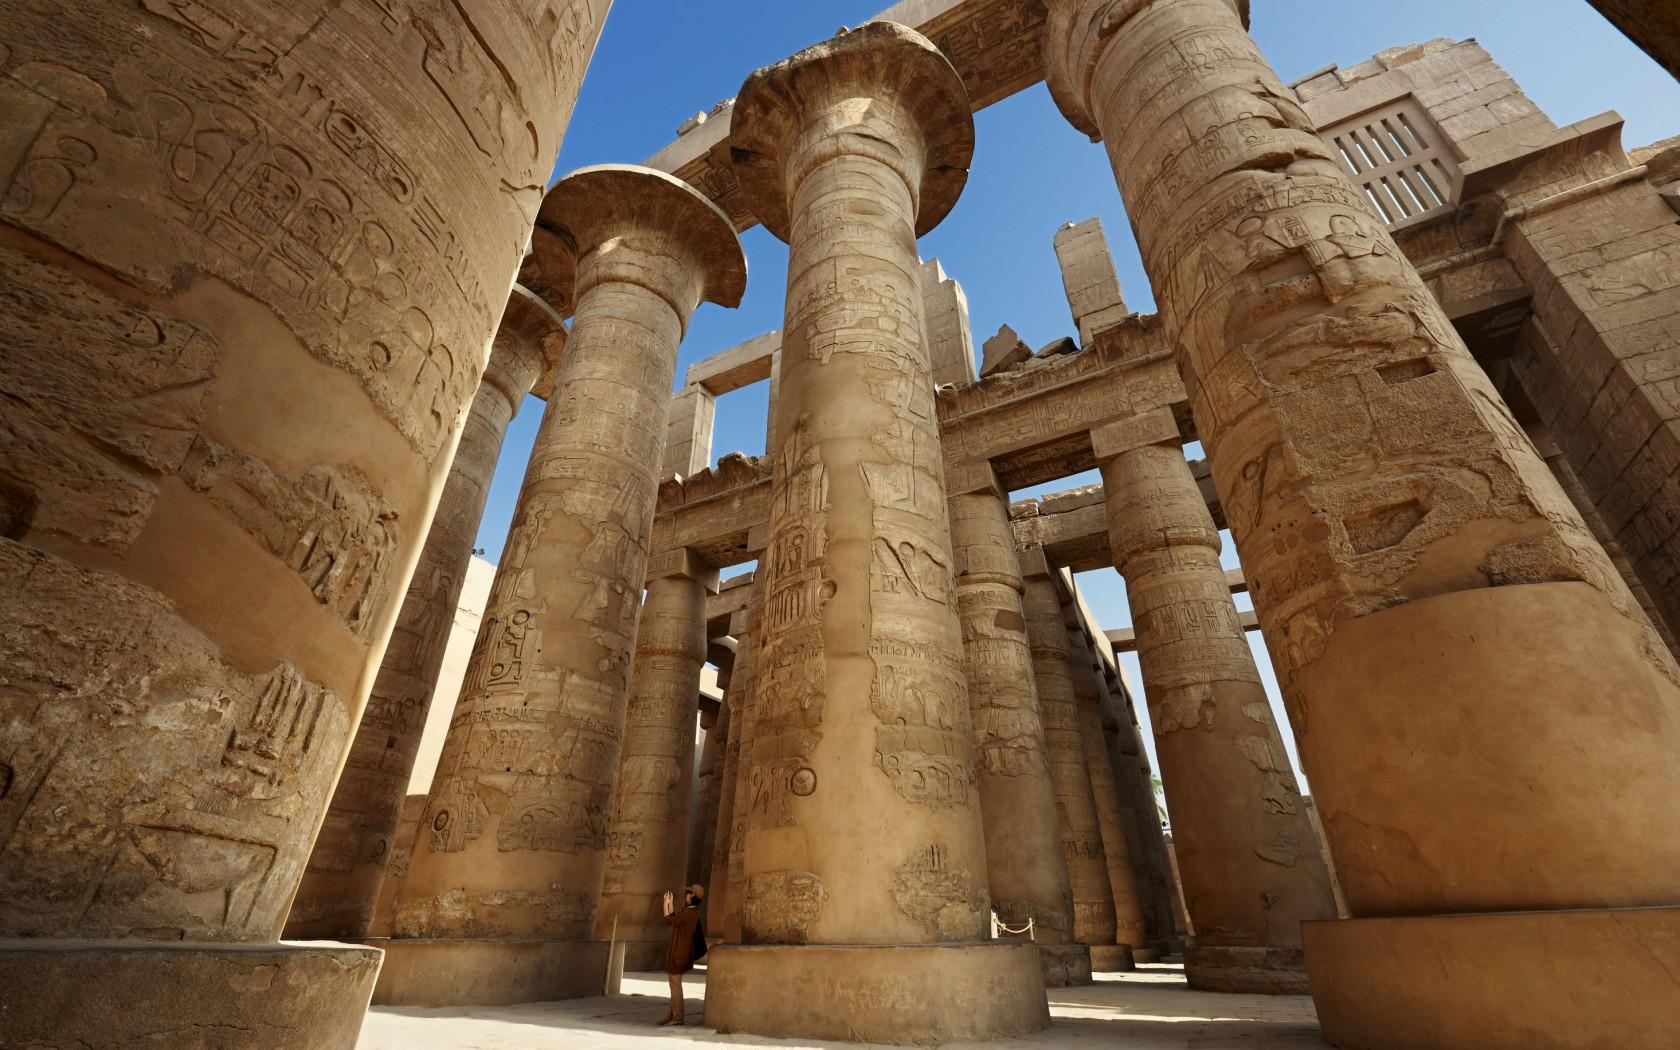 Cairo NIle Cruise holiday - Luxor tours